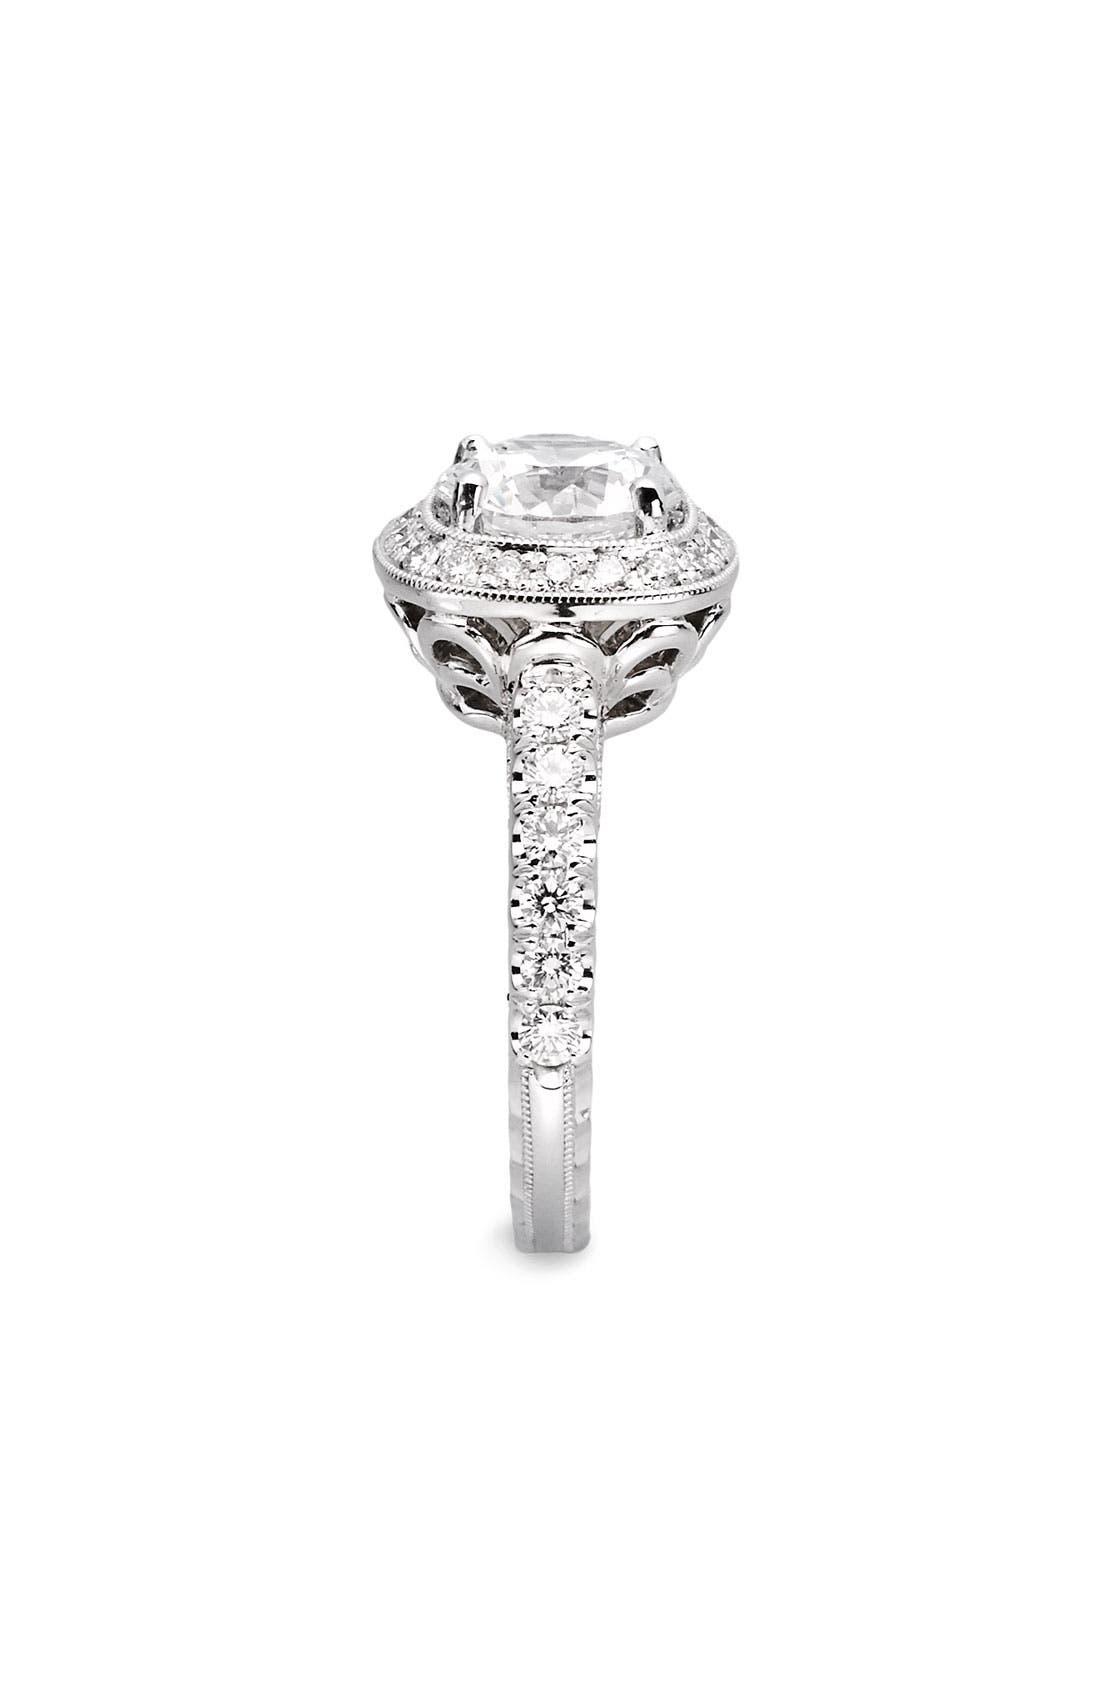 Alternate Image 2  - Jack Kelége 'Romance' Cushion Set Diamond Engagement Ring Setting